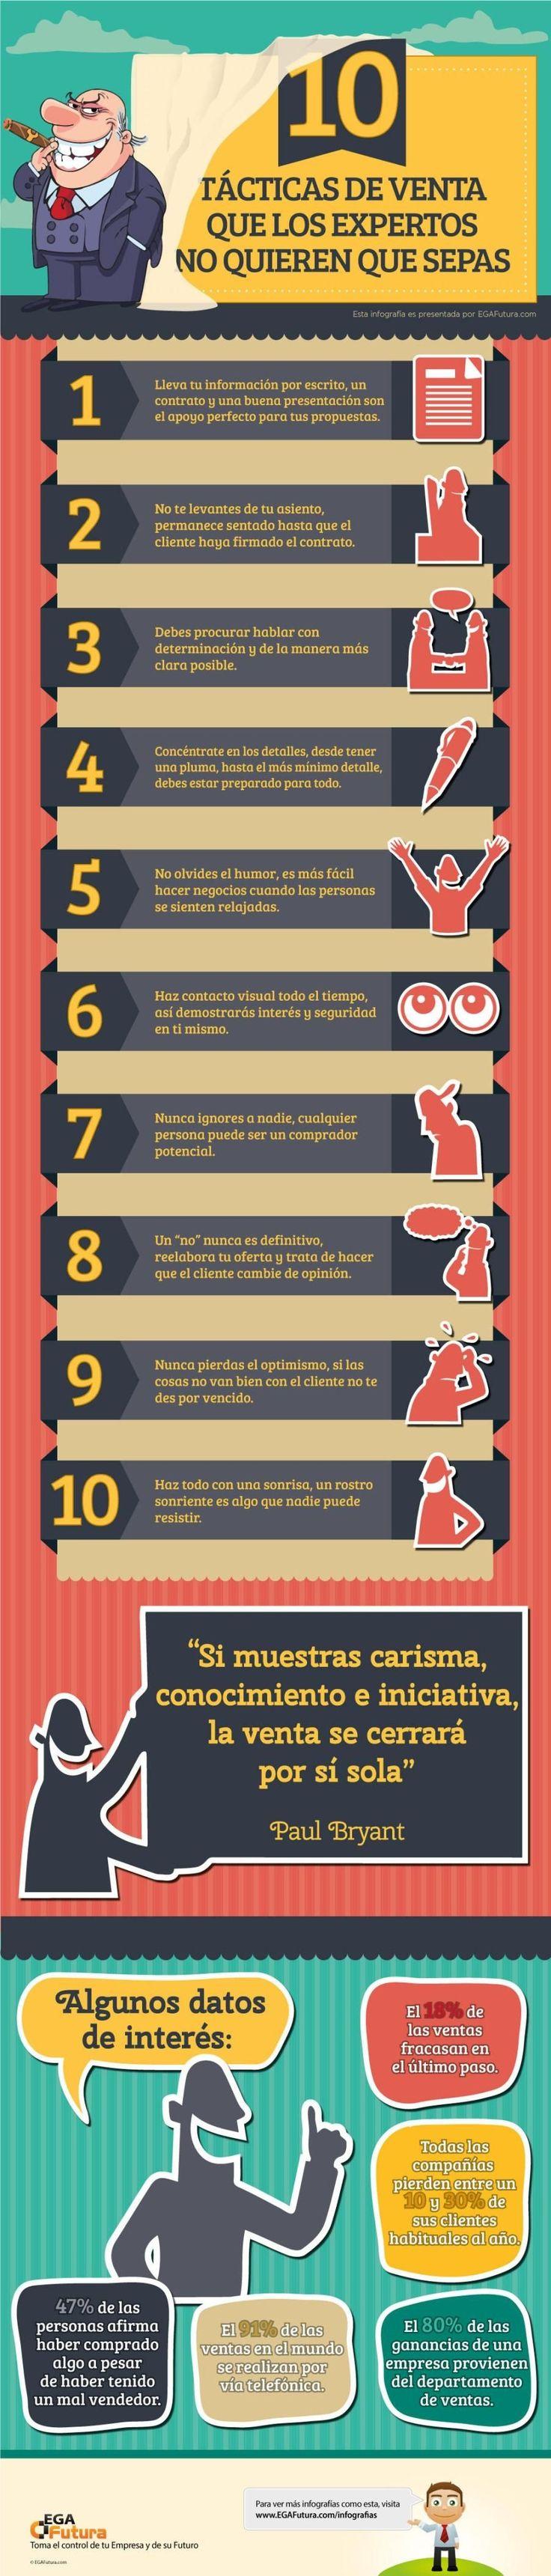 10 tácticas de venta